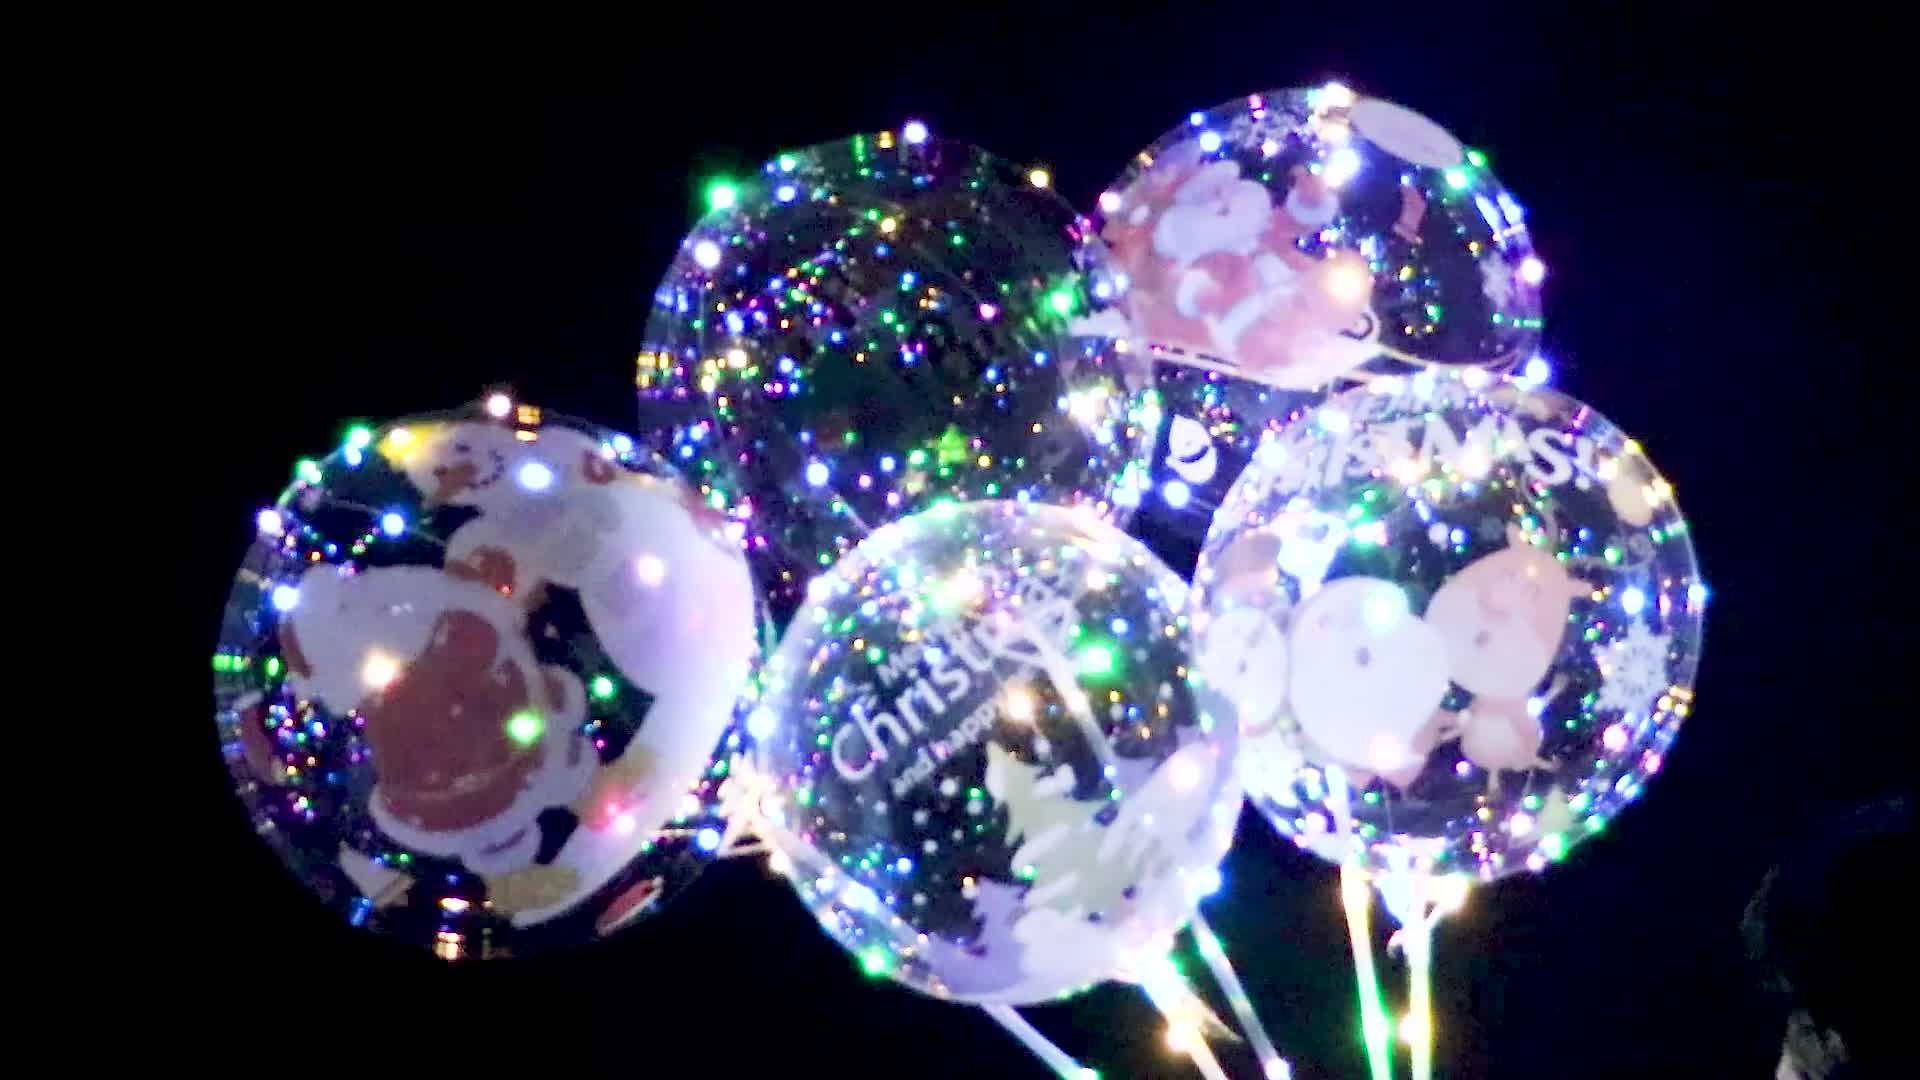 High Quality Custom Bobo Ballon 18/20 Inches Colorful LED Balloon Light flashing balon New Year Wedding Party Decoration globos